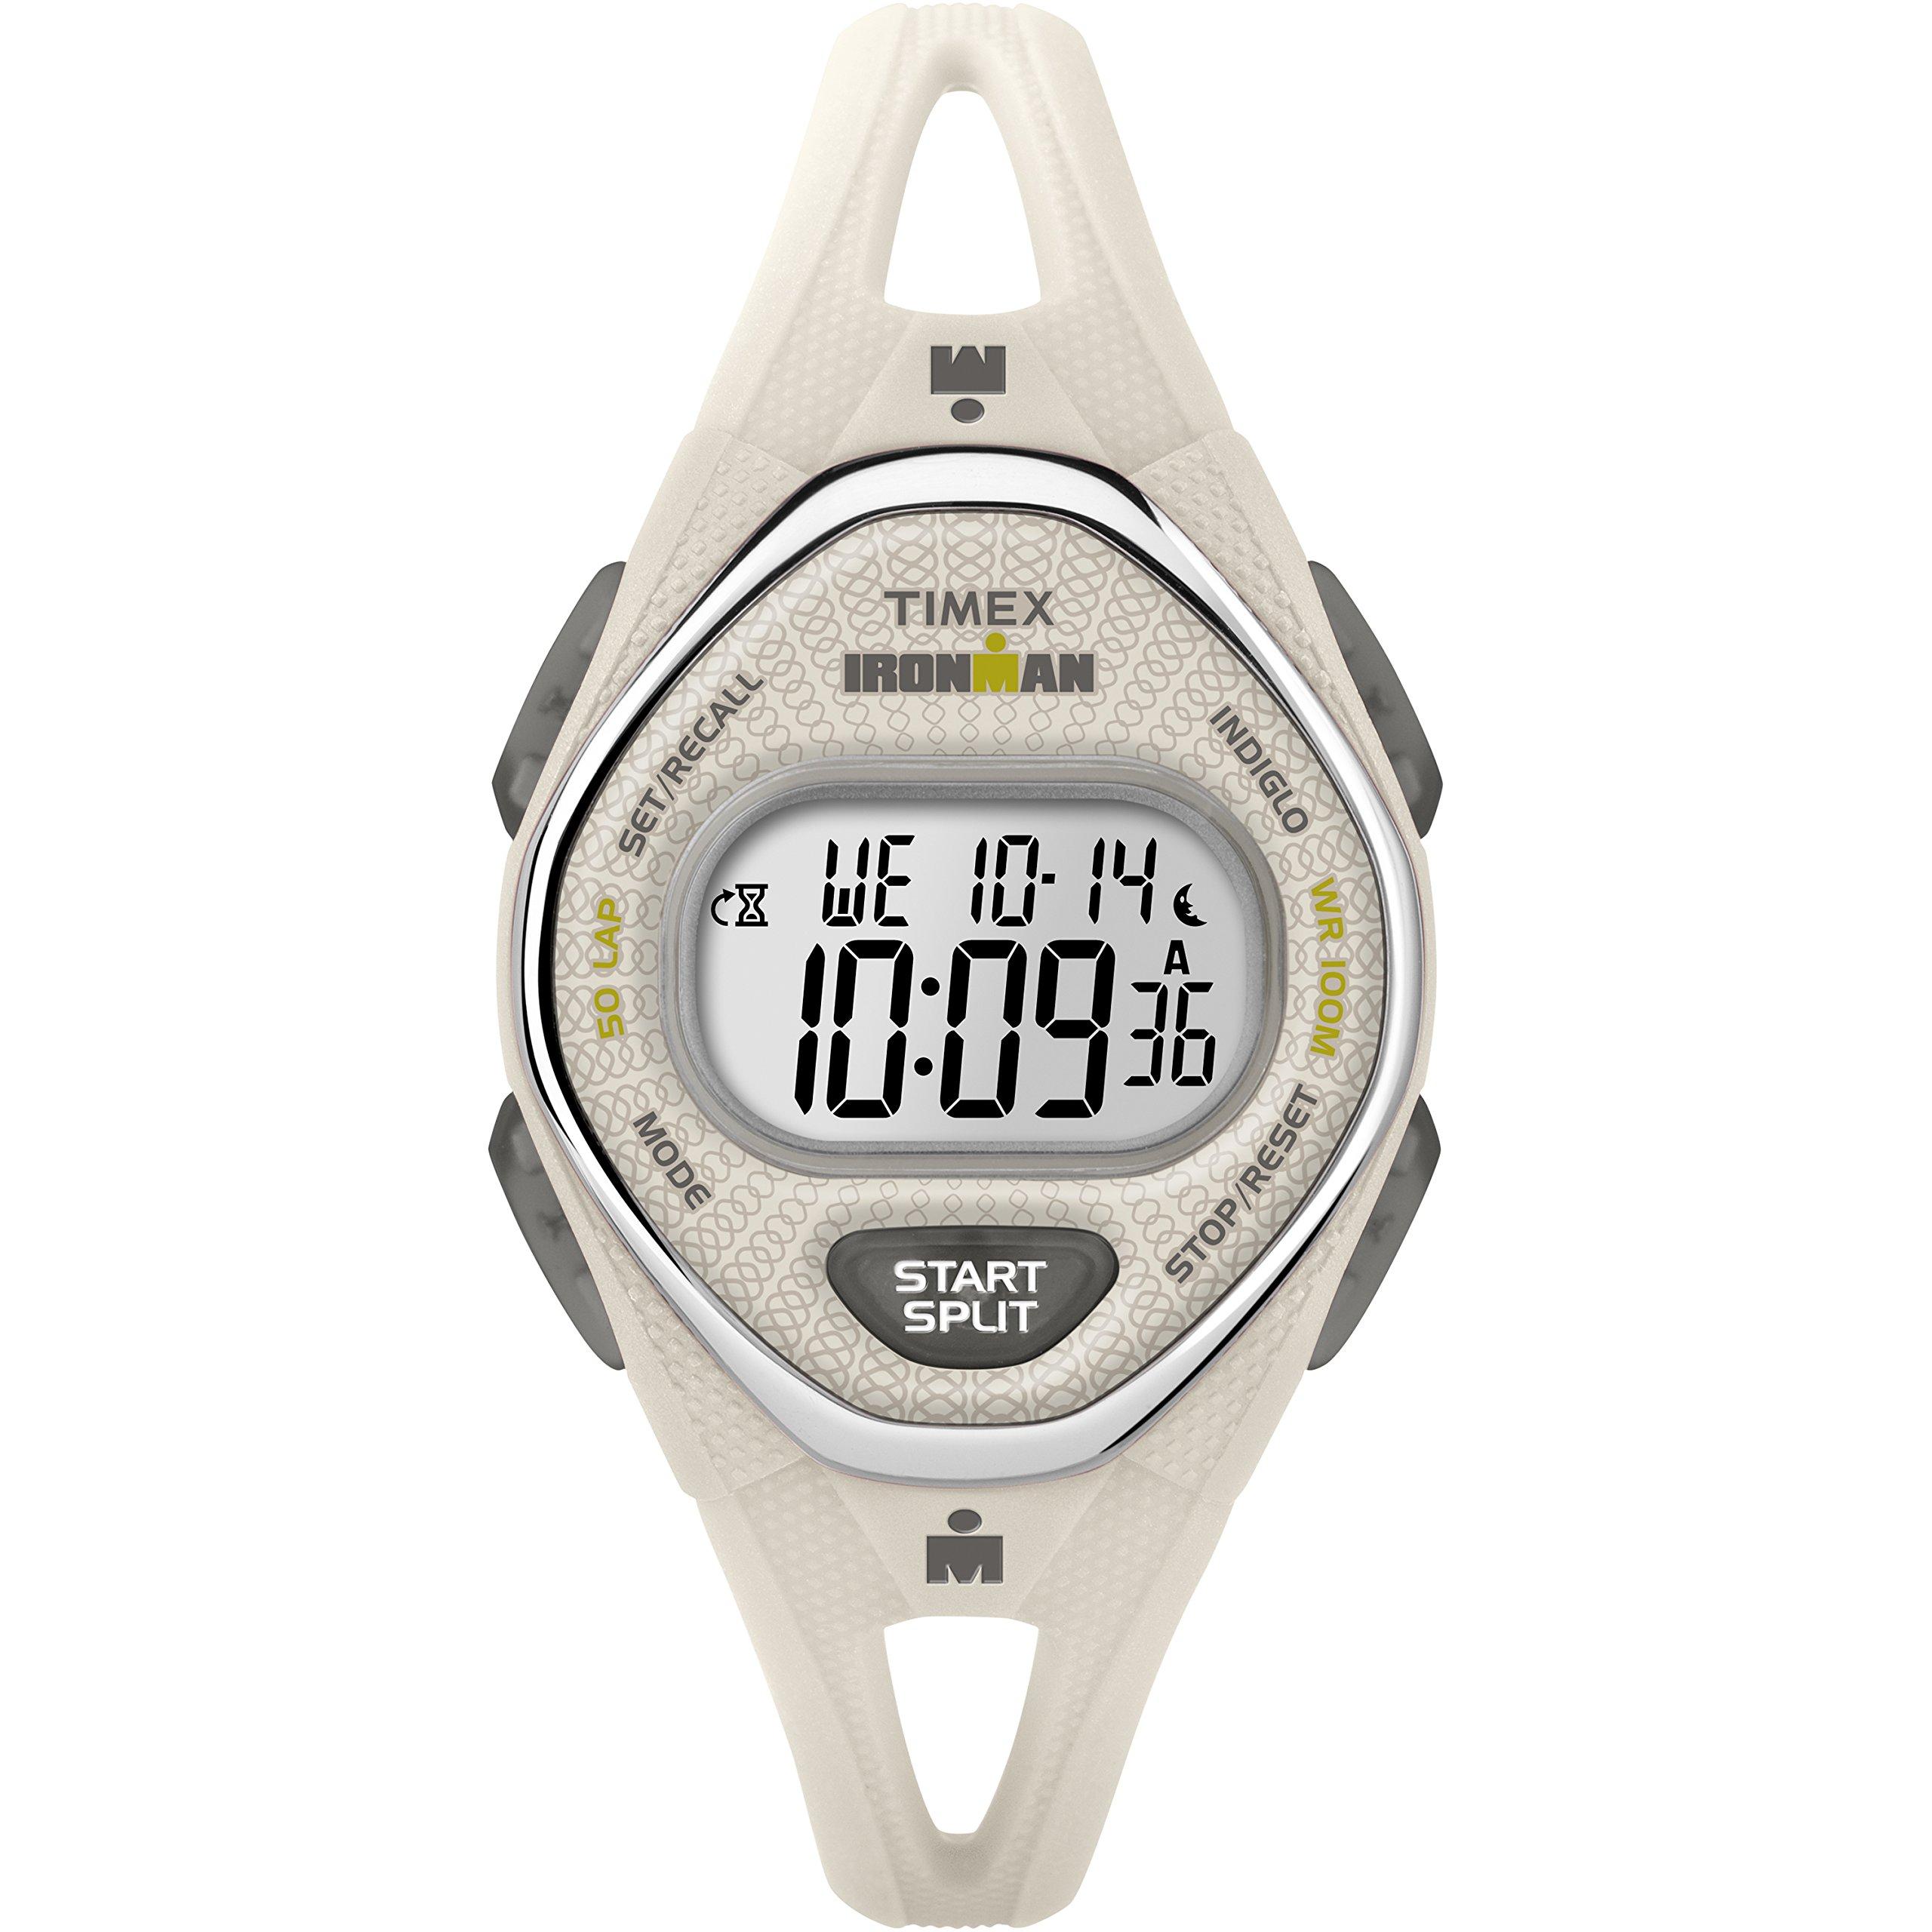 Timex Women's TW5M10800 Ironman Sleek 50 White Silicone Strap Watch